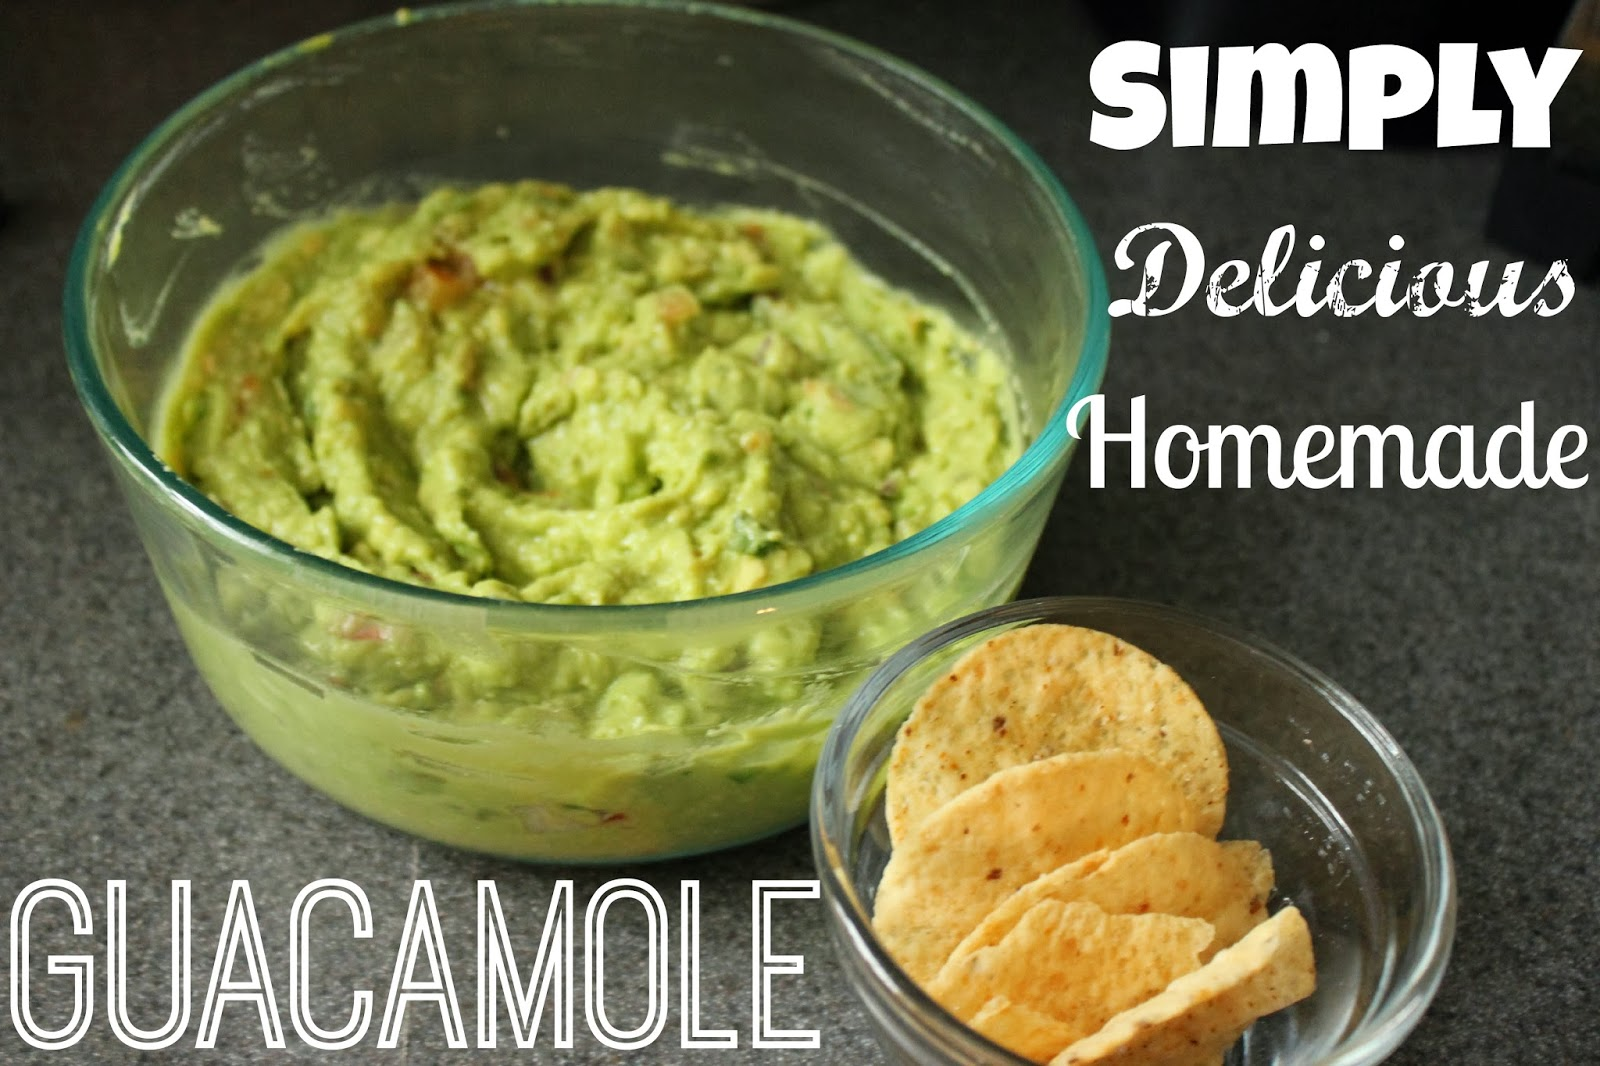 Simple and Delicious Homemade Guacamole